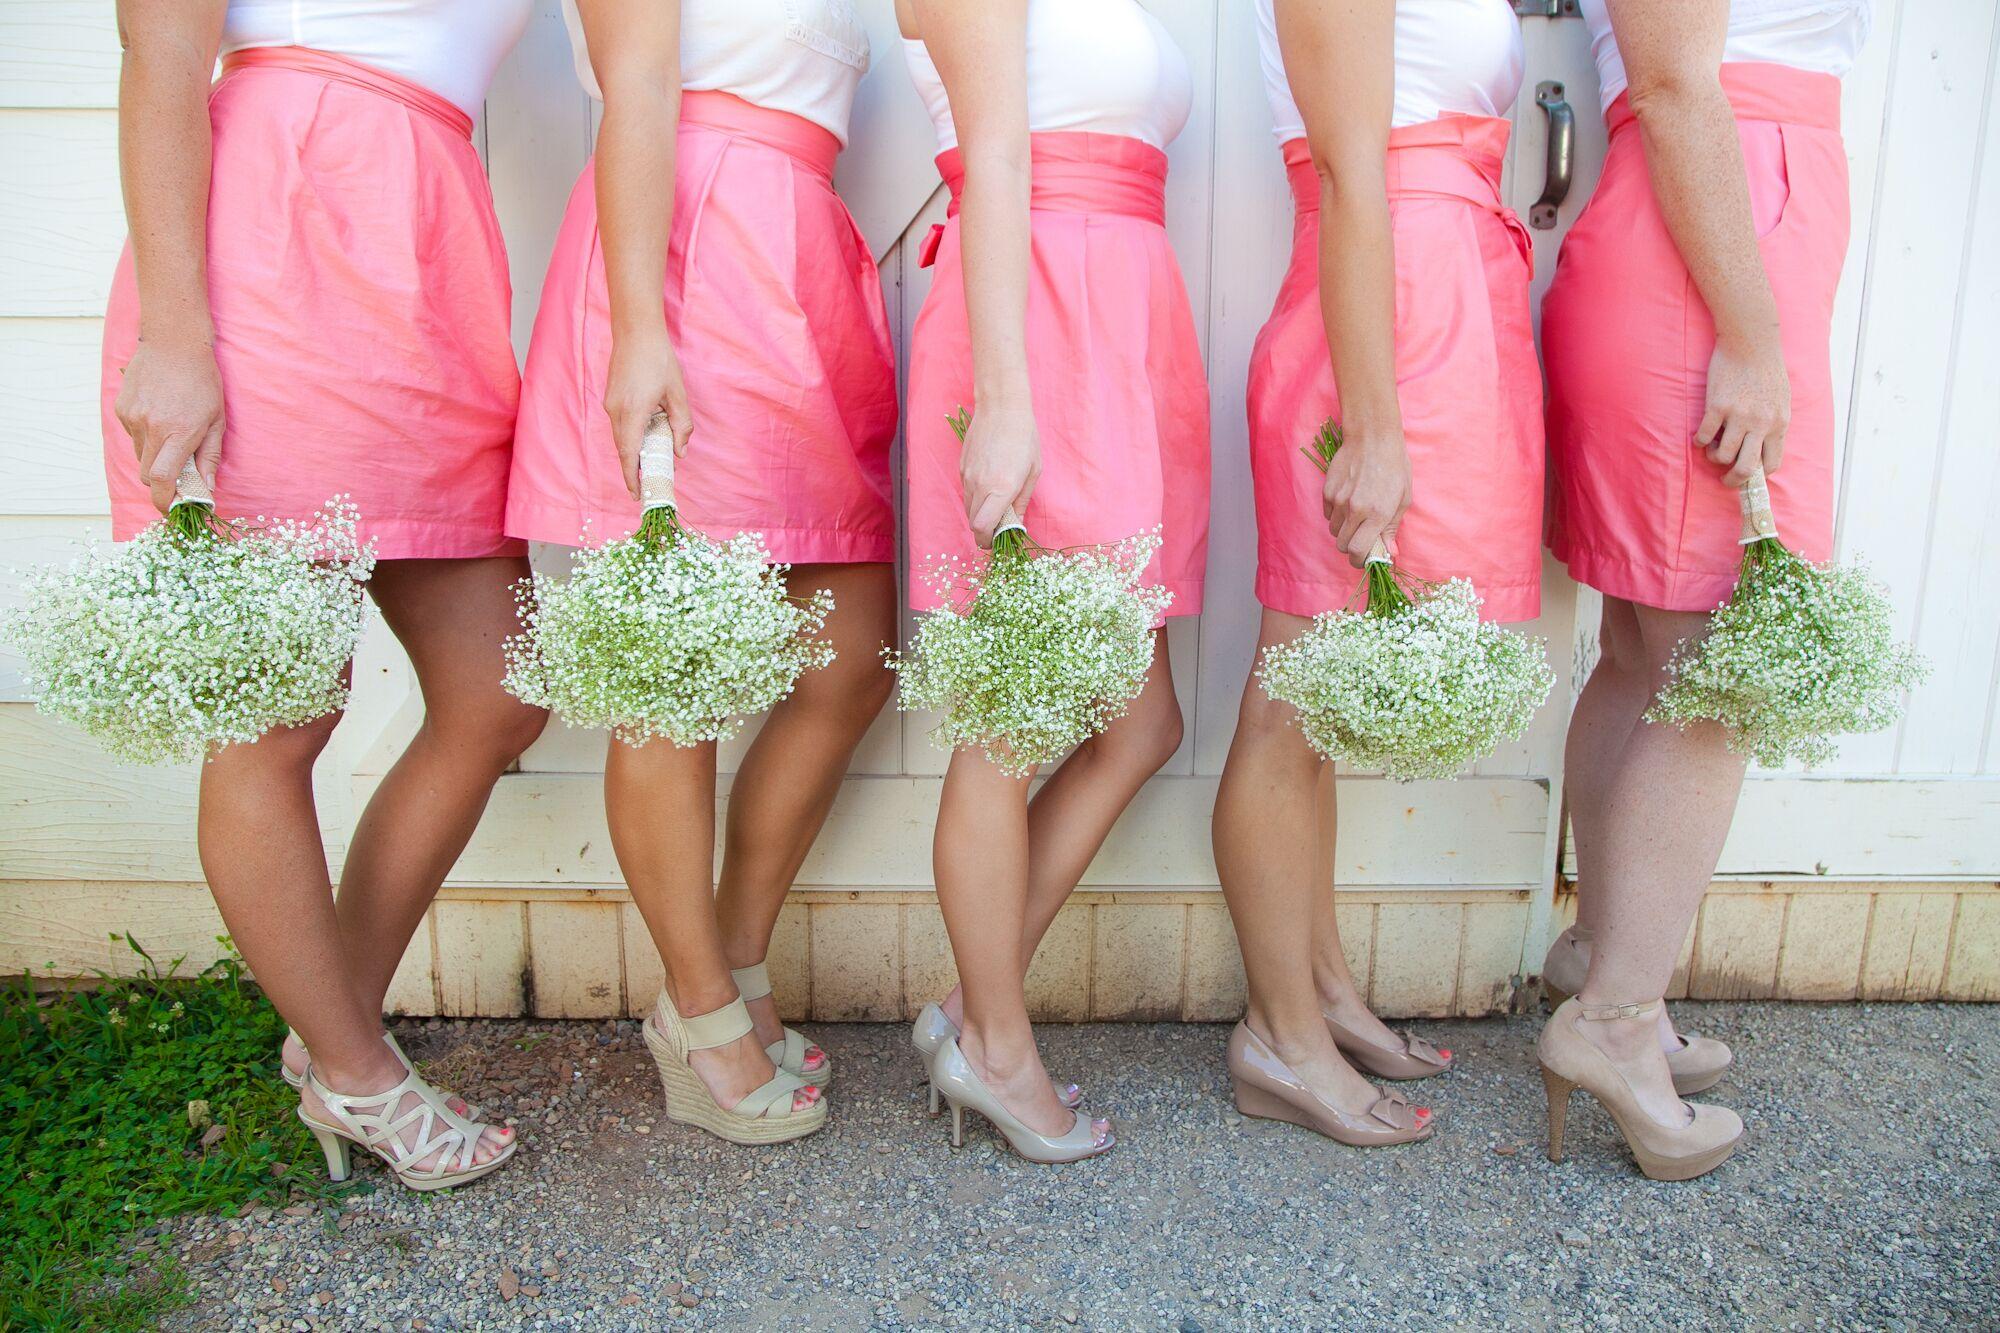 Preppy Pink and Khaki Wedding Party Attire